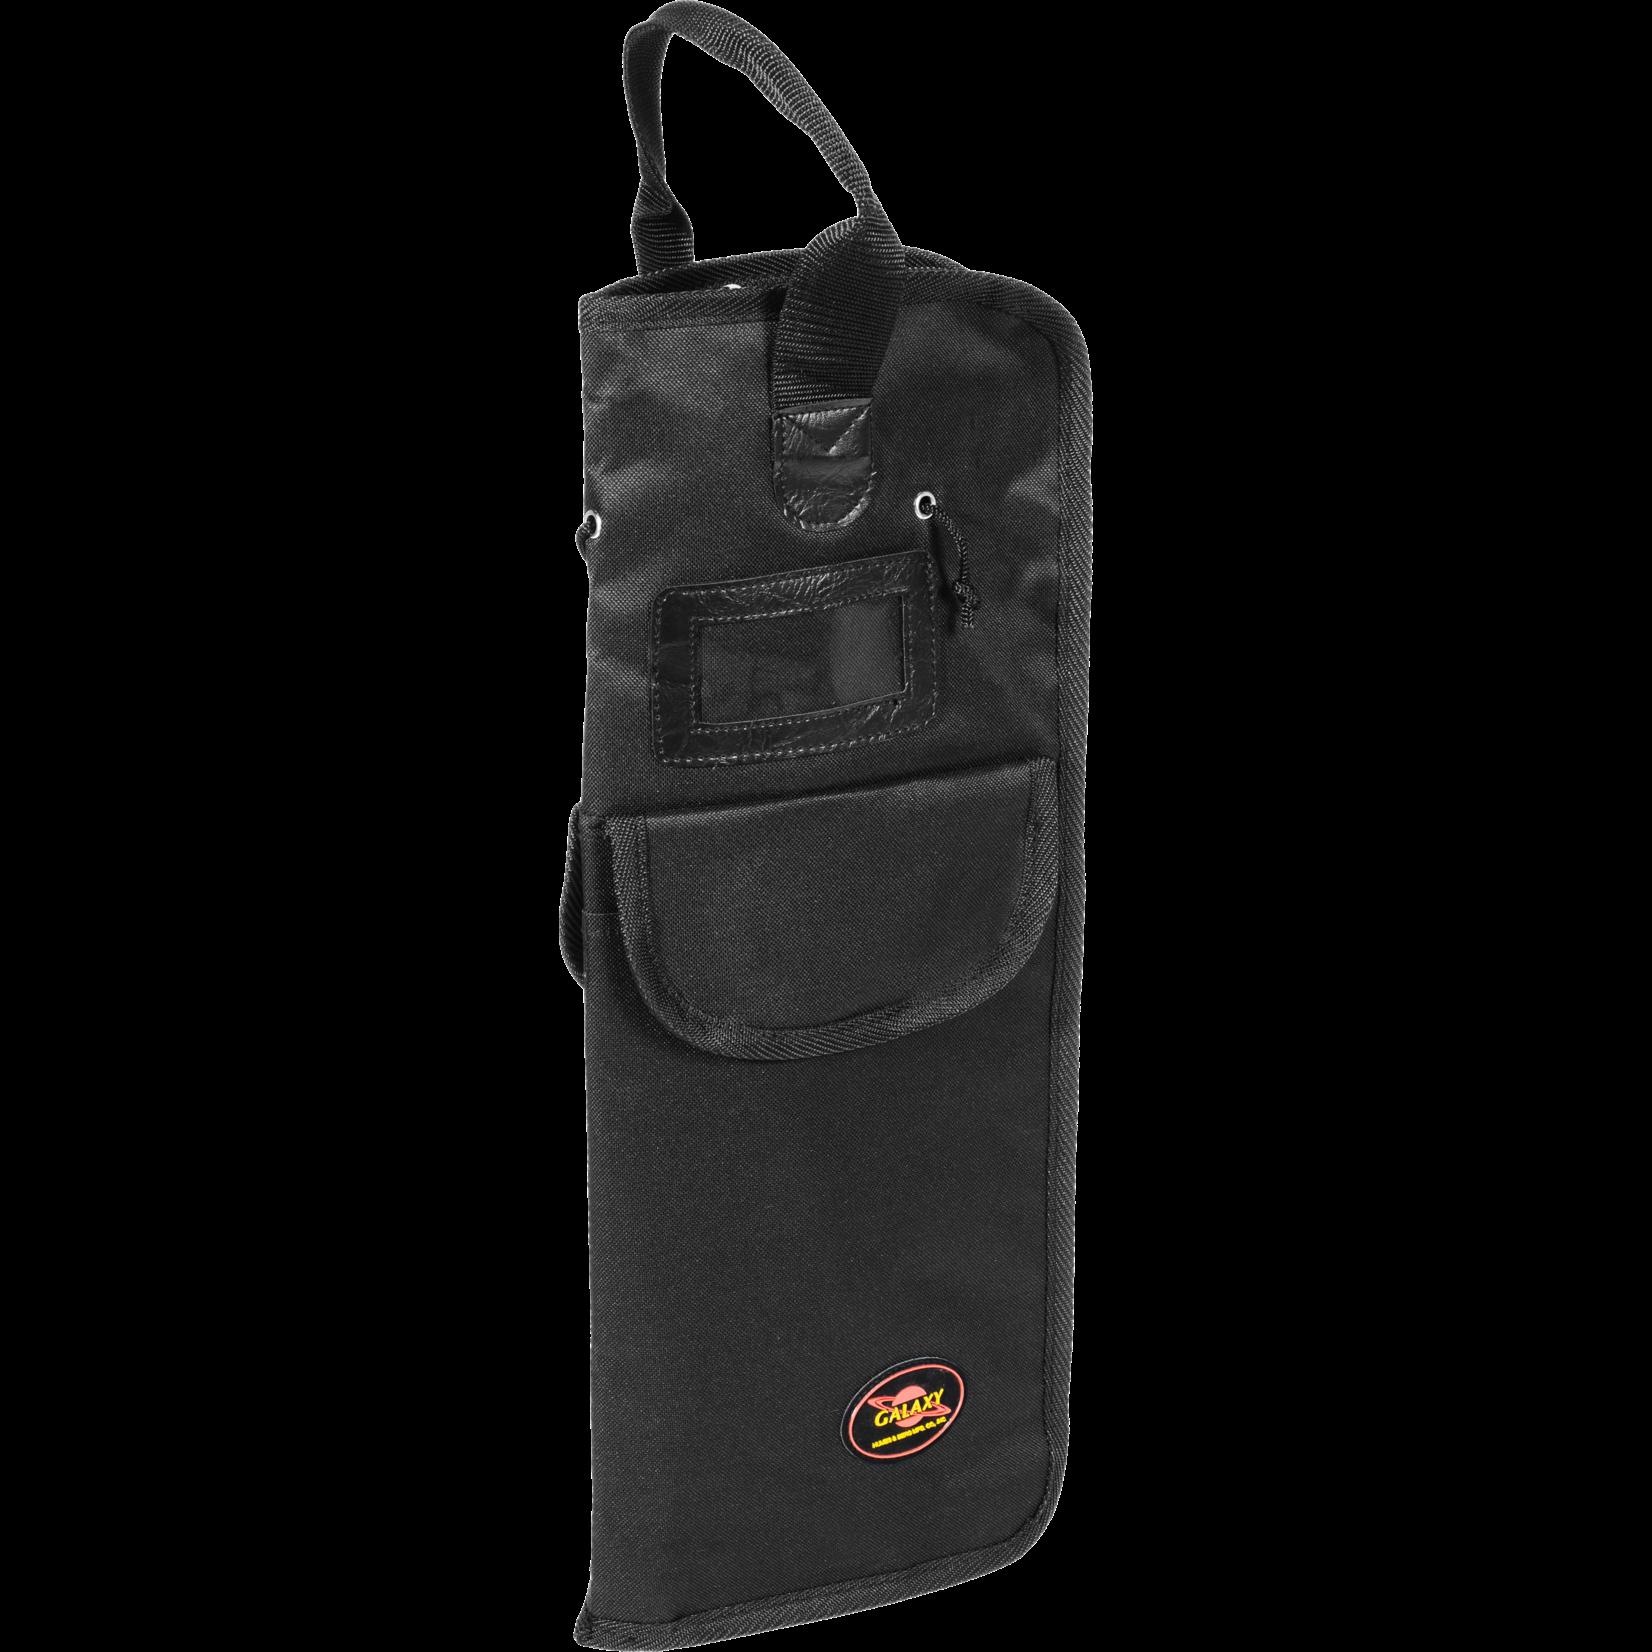 Humes and Berg Humes and Berg Galaxy Stick Bag w/Strap